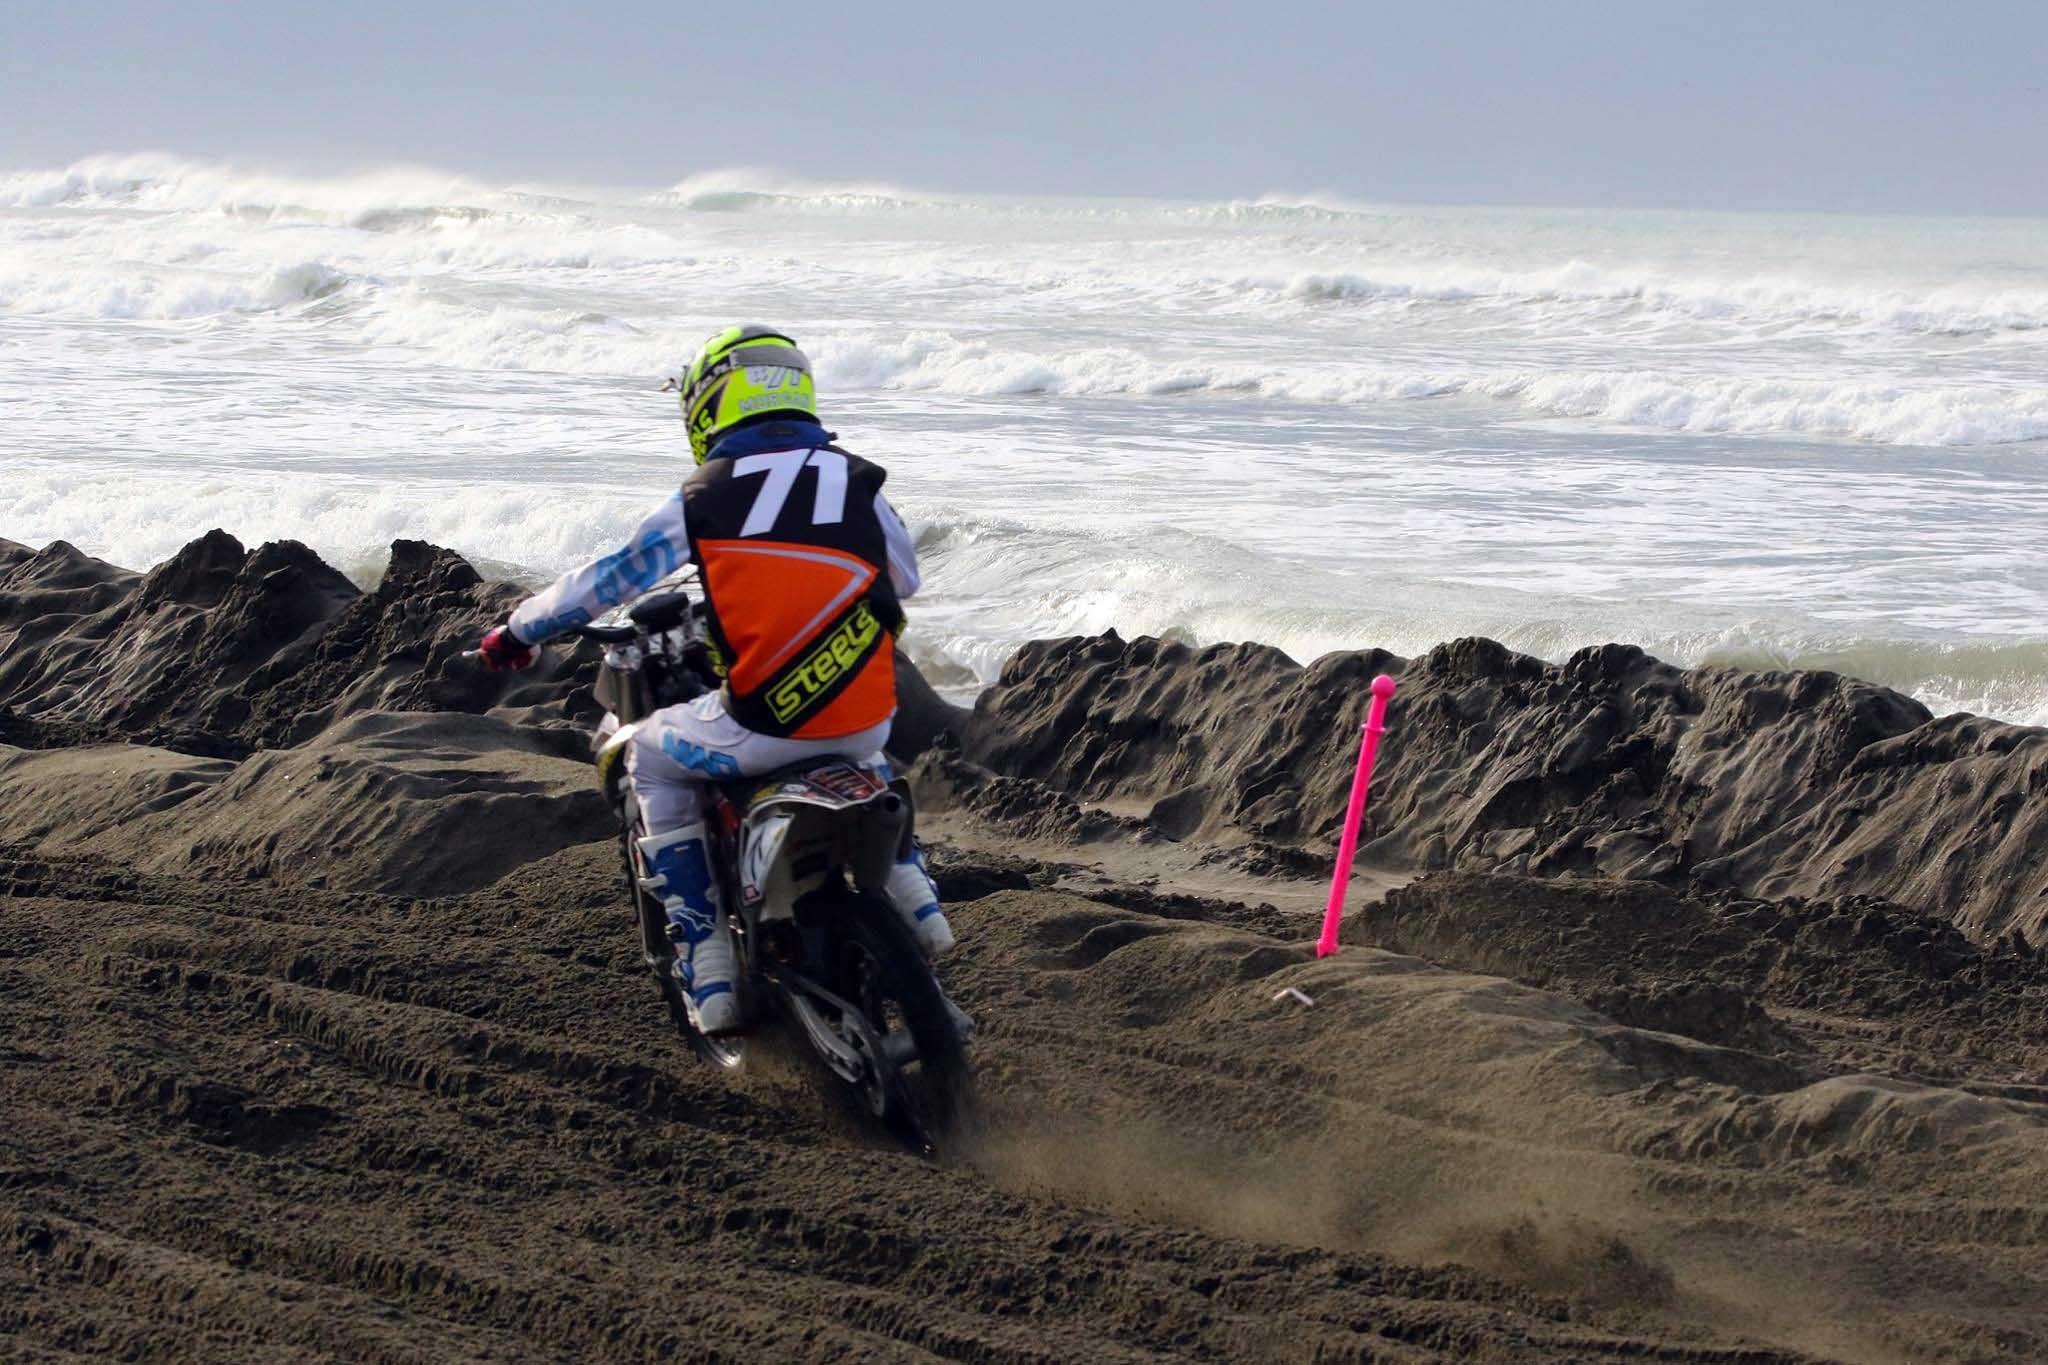 Steels Motocross quarta agli Internazionali d'Italia su sabbia